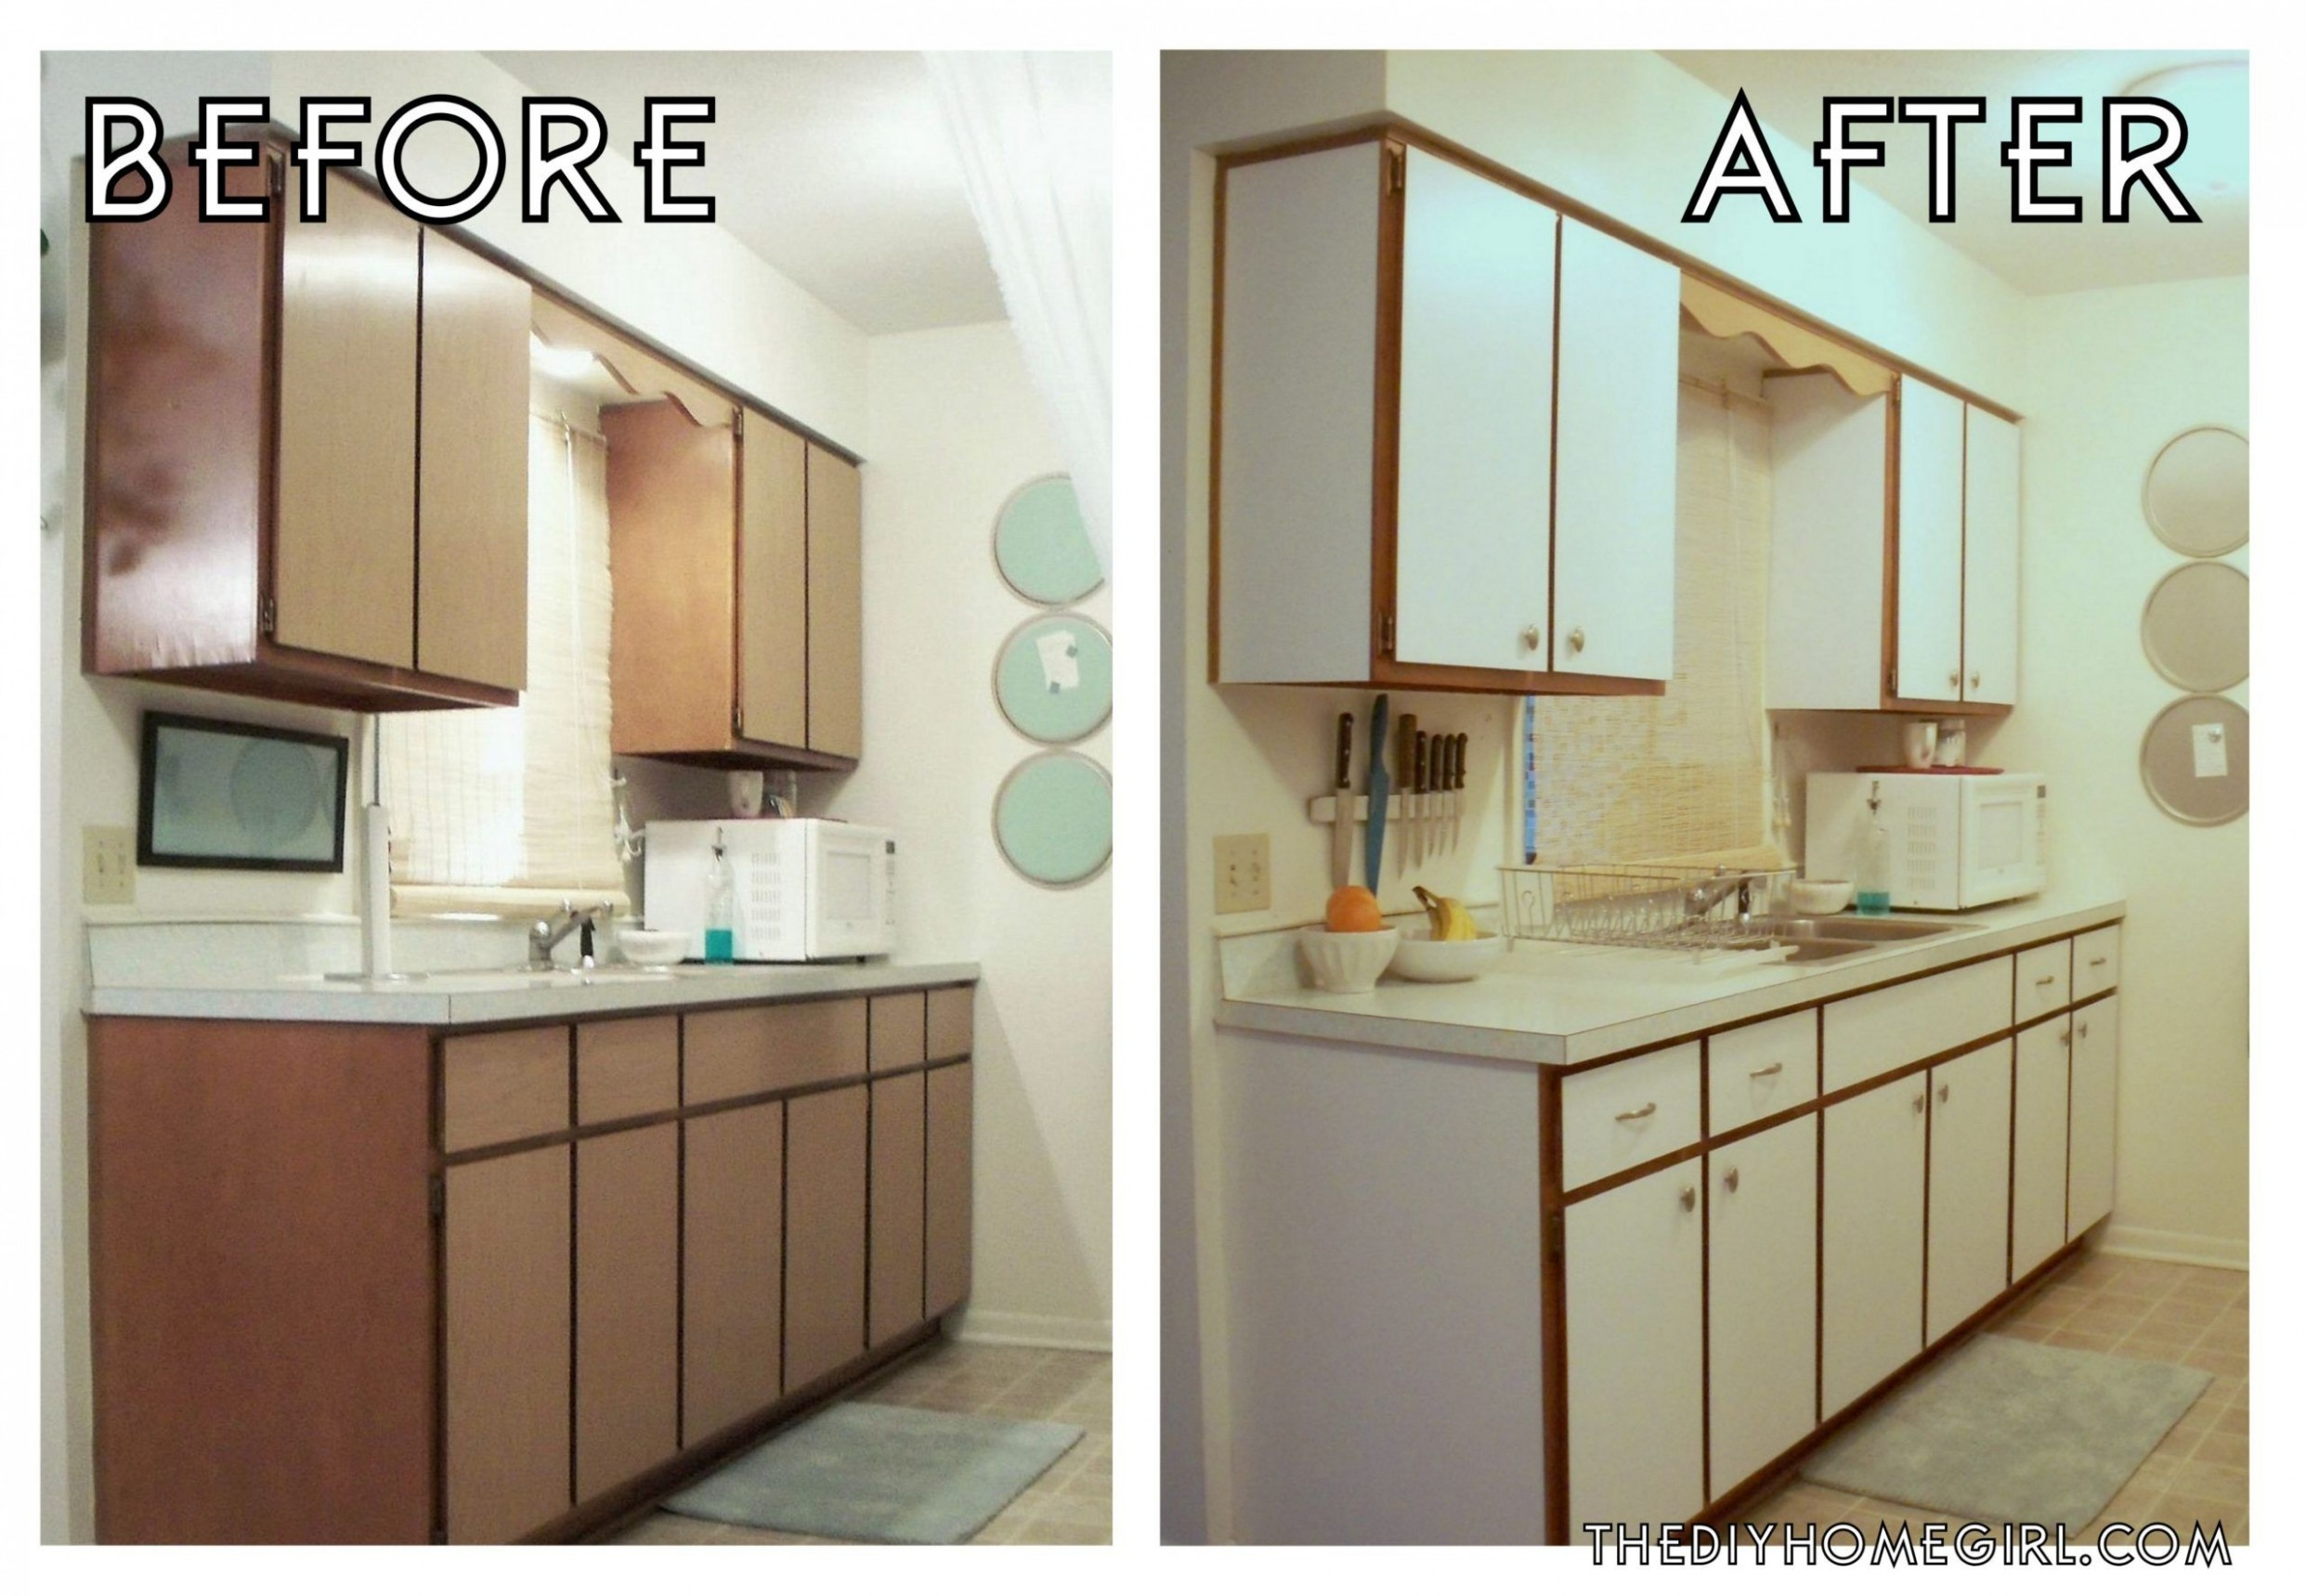 Pin on Best Home Design Ideas - Apartment Kitchen Wall Decor Ideas